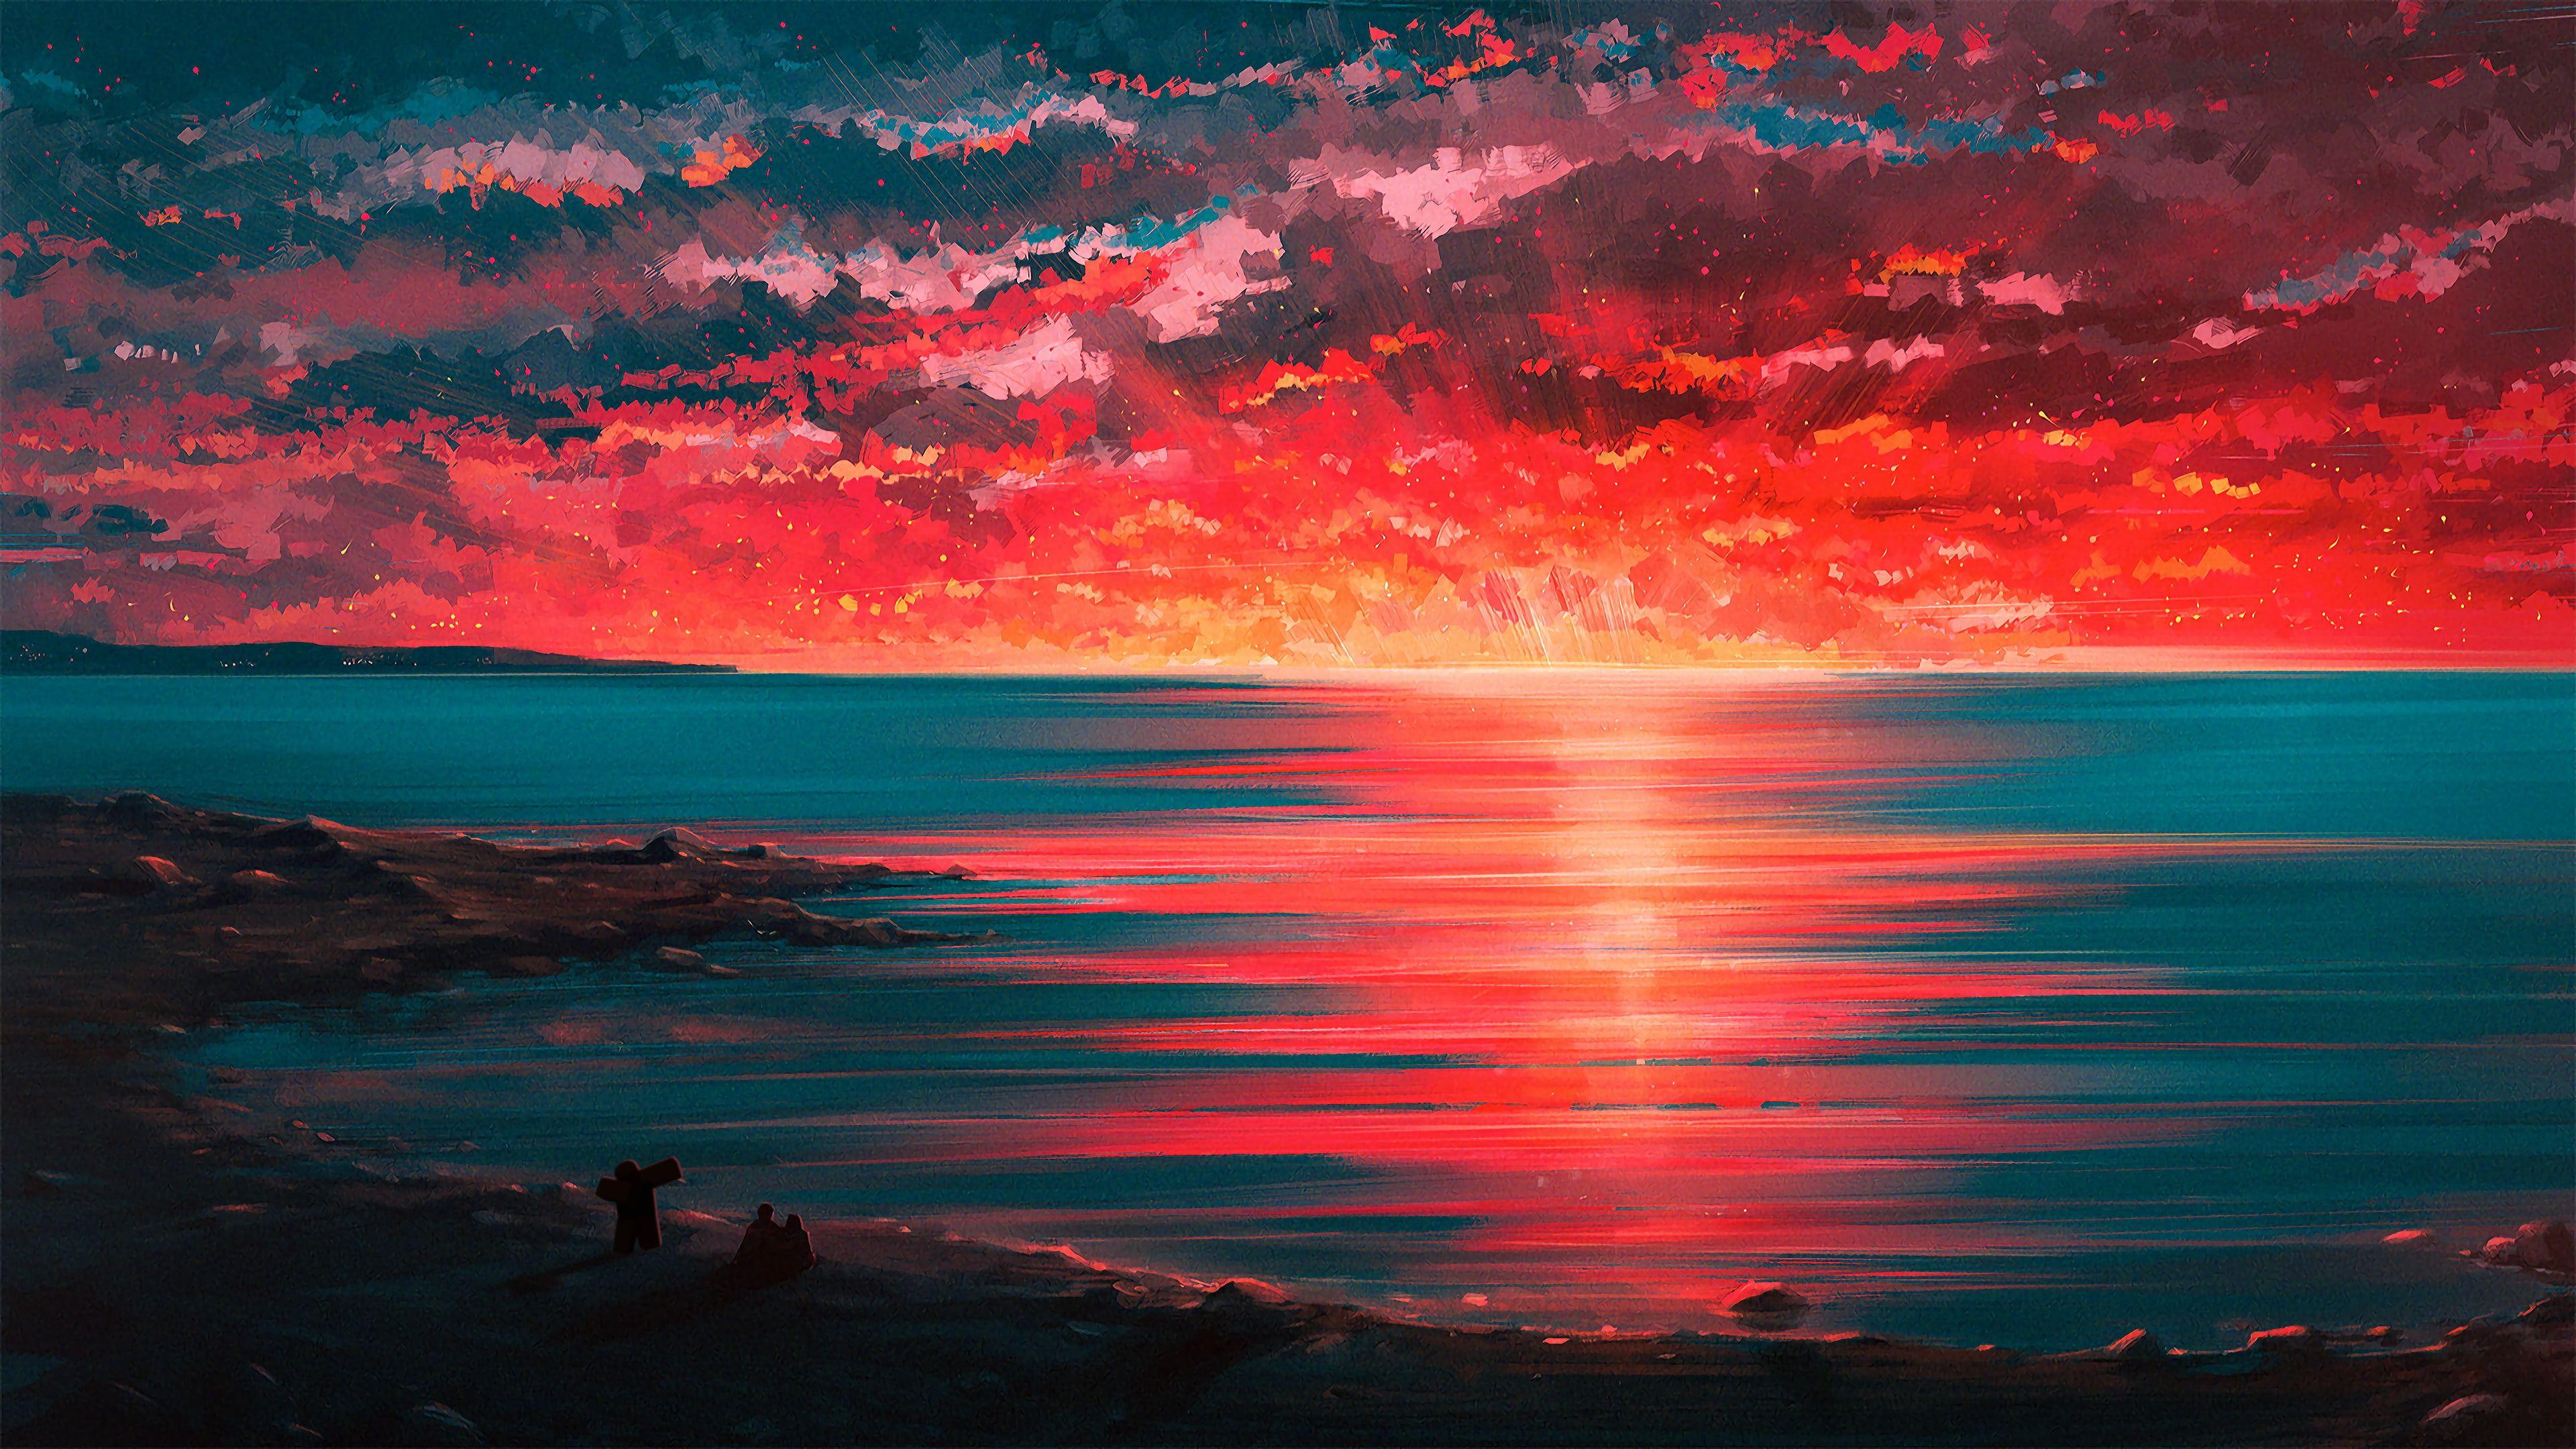 4k Speed Paint Beach Digital Art Sunset Horizon Couple Seaside 4k Wallpaper Hdwallpaper Desktop In 2020 Sunset Painting Art Art Wallpaper